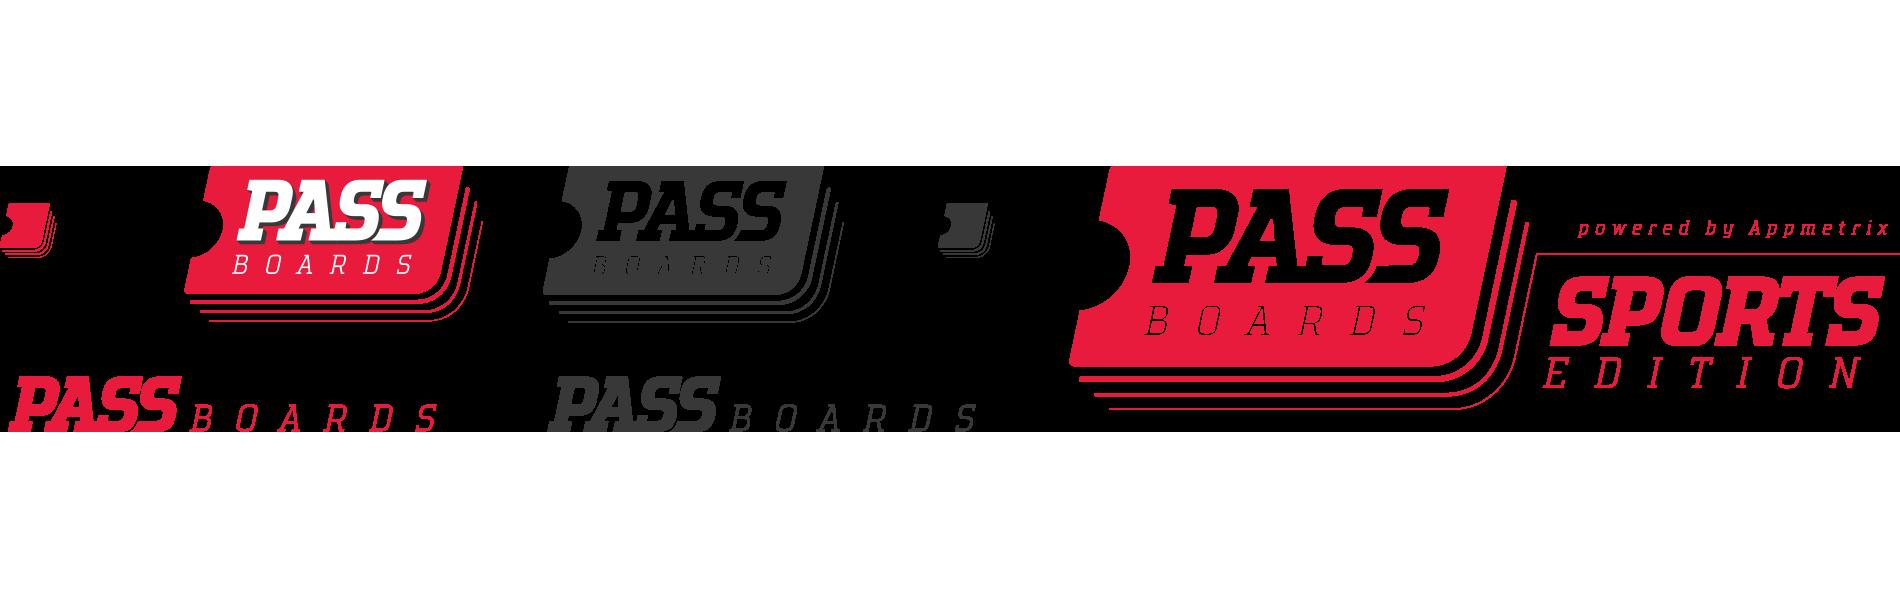 PAS_logomix